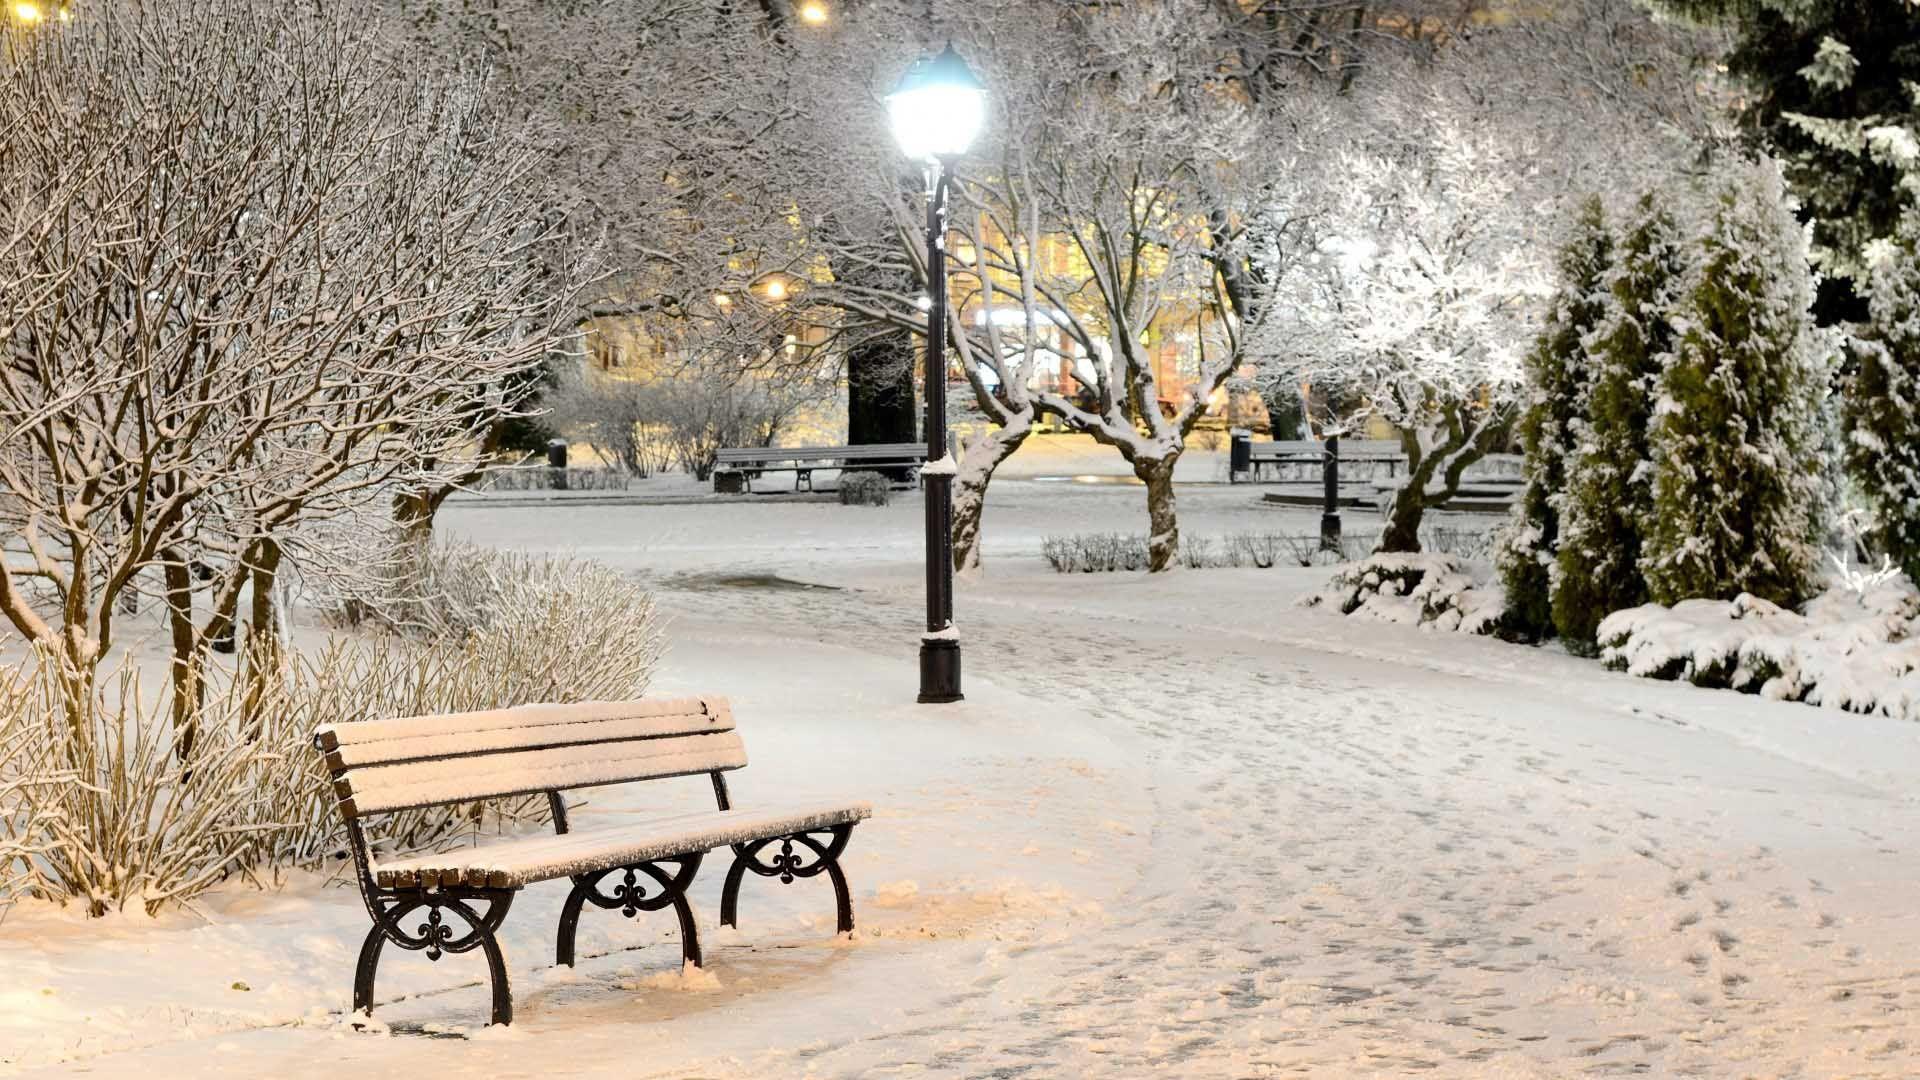 Central Park Bench In The Snow Google Search Winter Wonderland Wallpaper Winter Wallpaper Winter Scenery